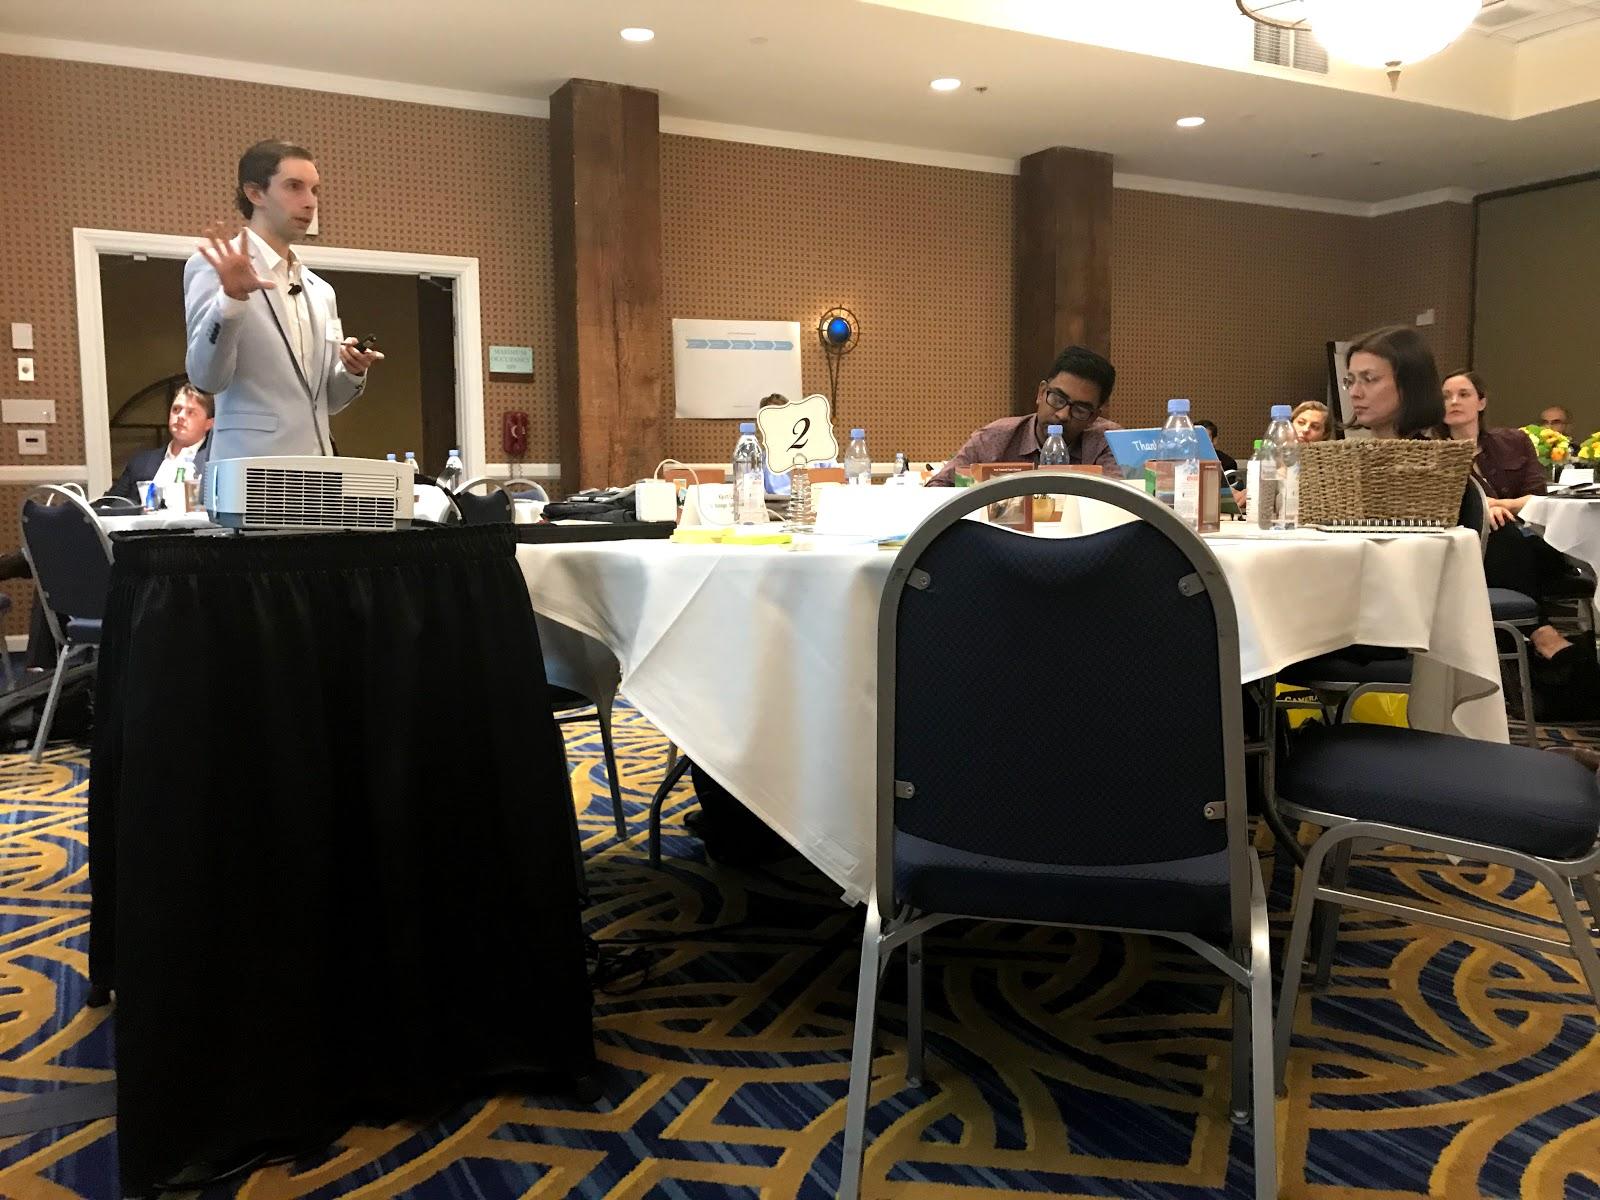 Tigh Loughhead and Gilad Raichshtain on the Einstein Customer Advisory Board